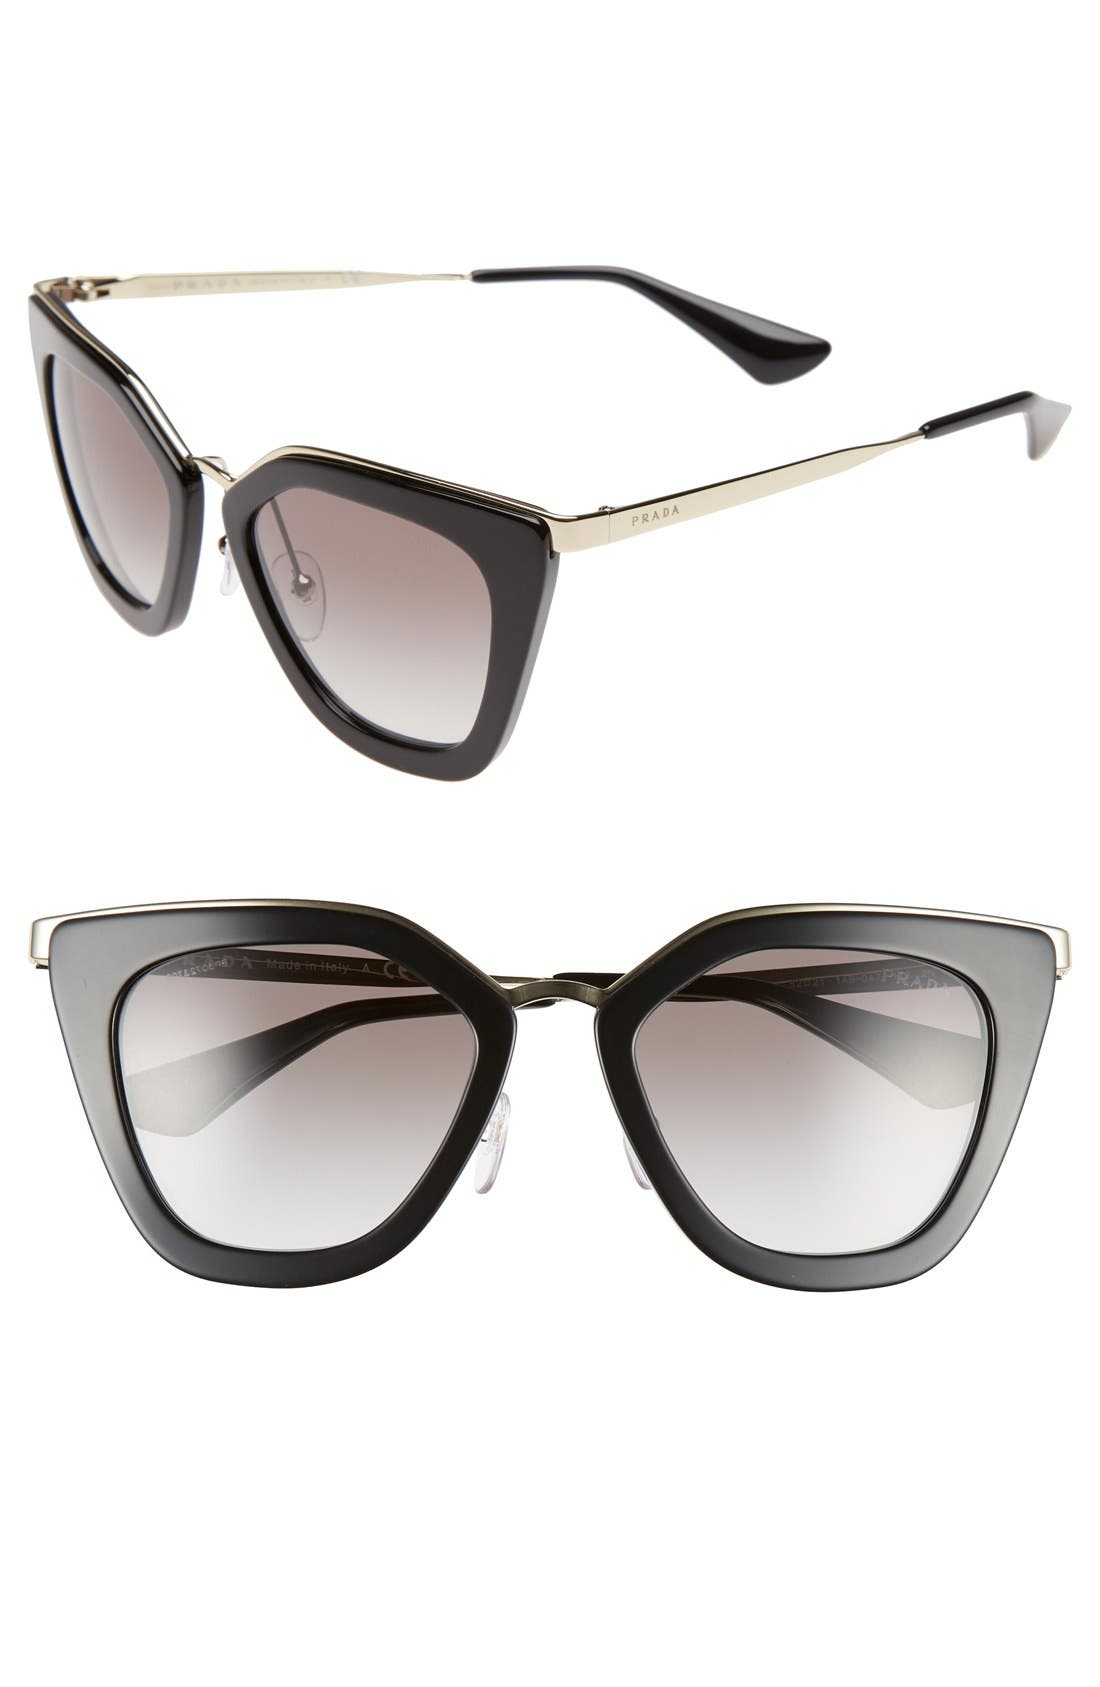 52mm Cat Eye Sunglasses,                         Main,                         color,